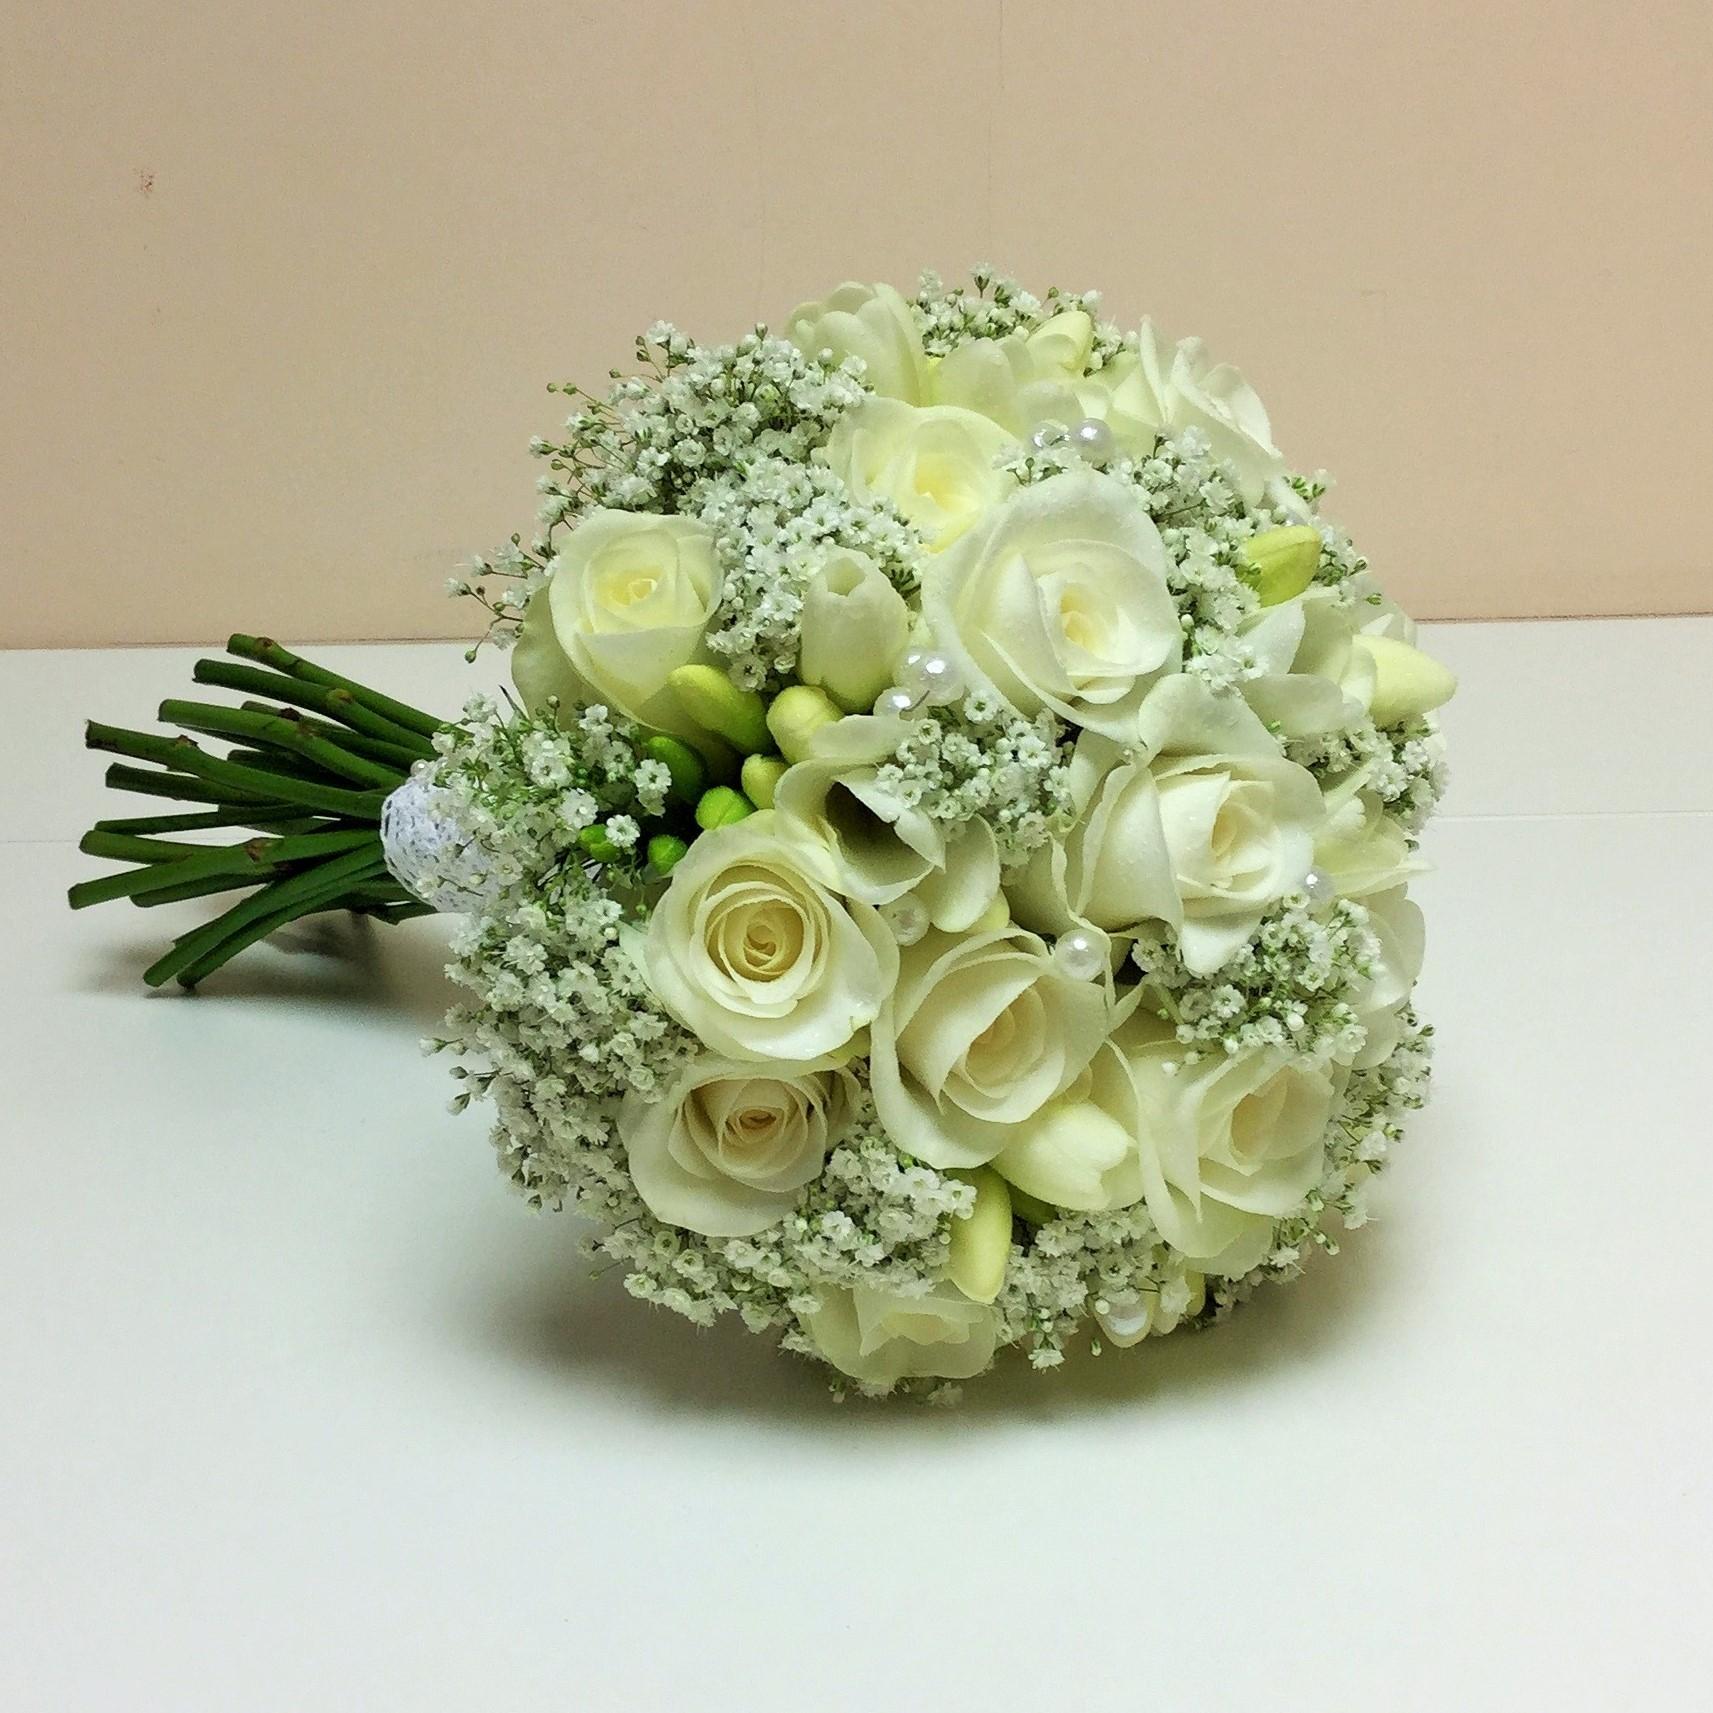 wedding hand bouquets photo - 1